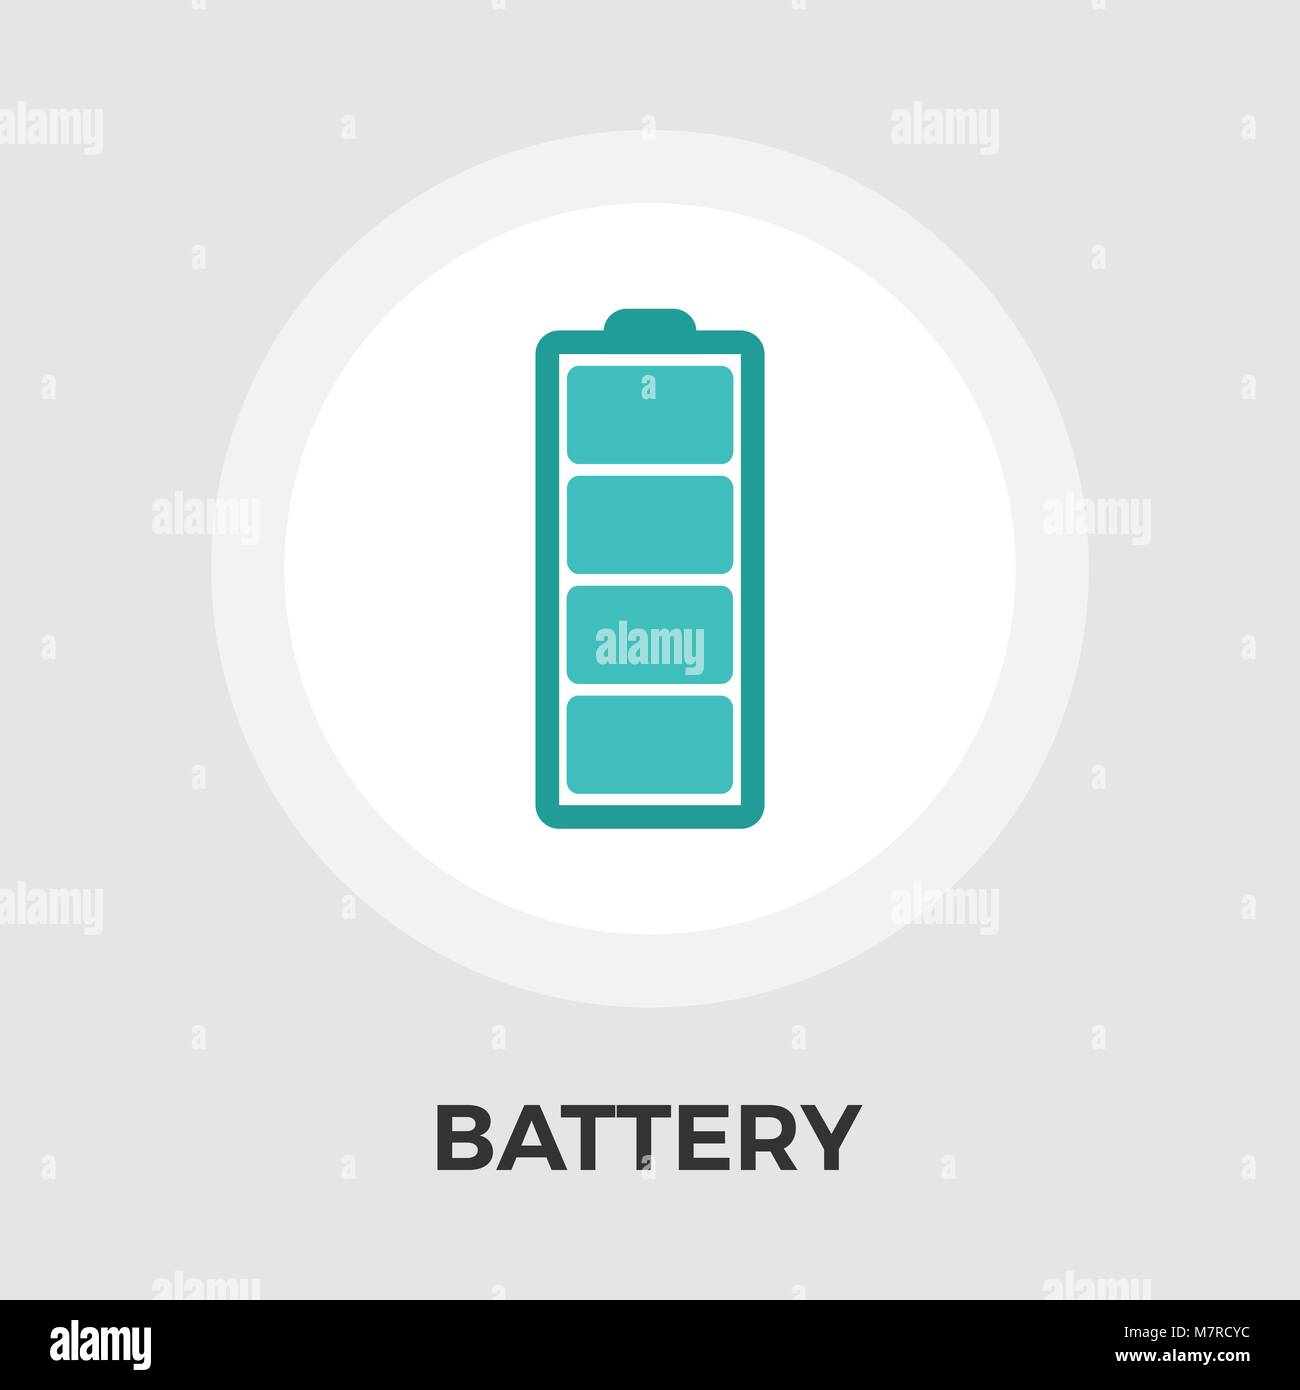 Electrical Symbol Stock Photos & Electrical Symbol Stock Images - Alamy